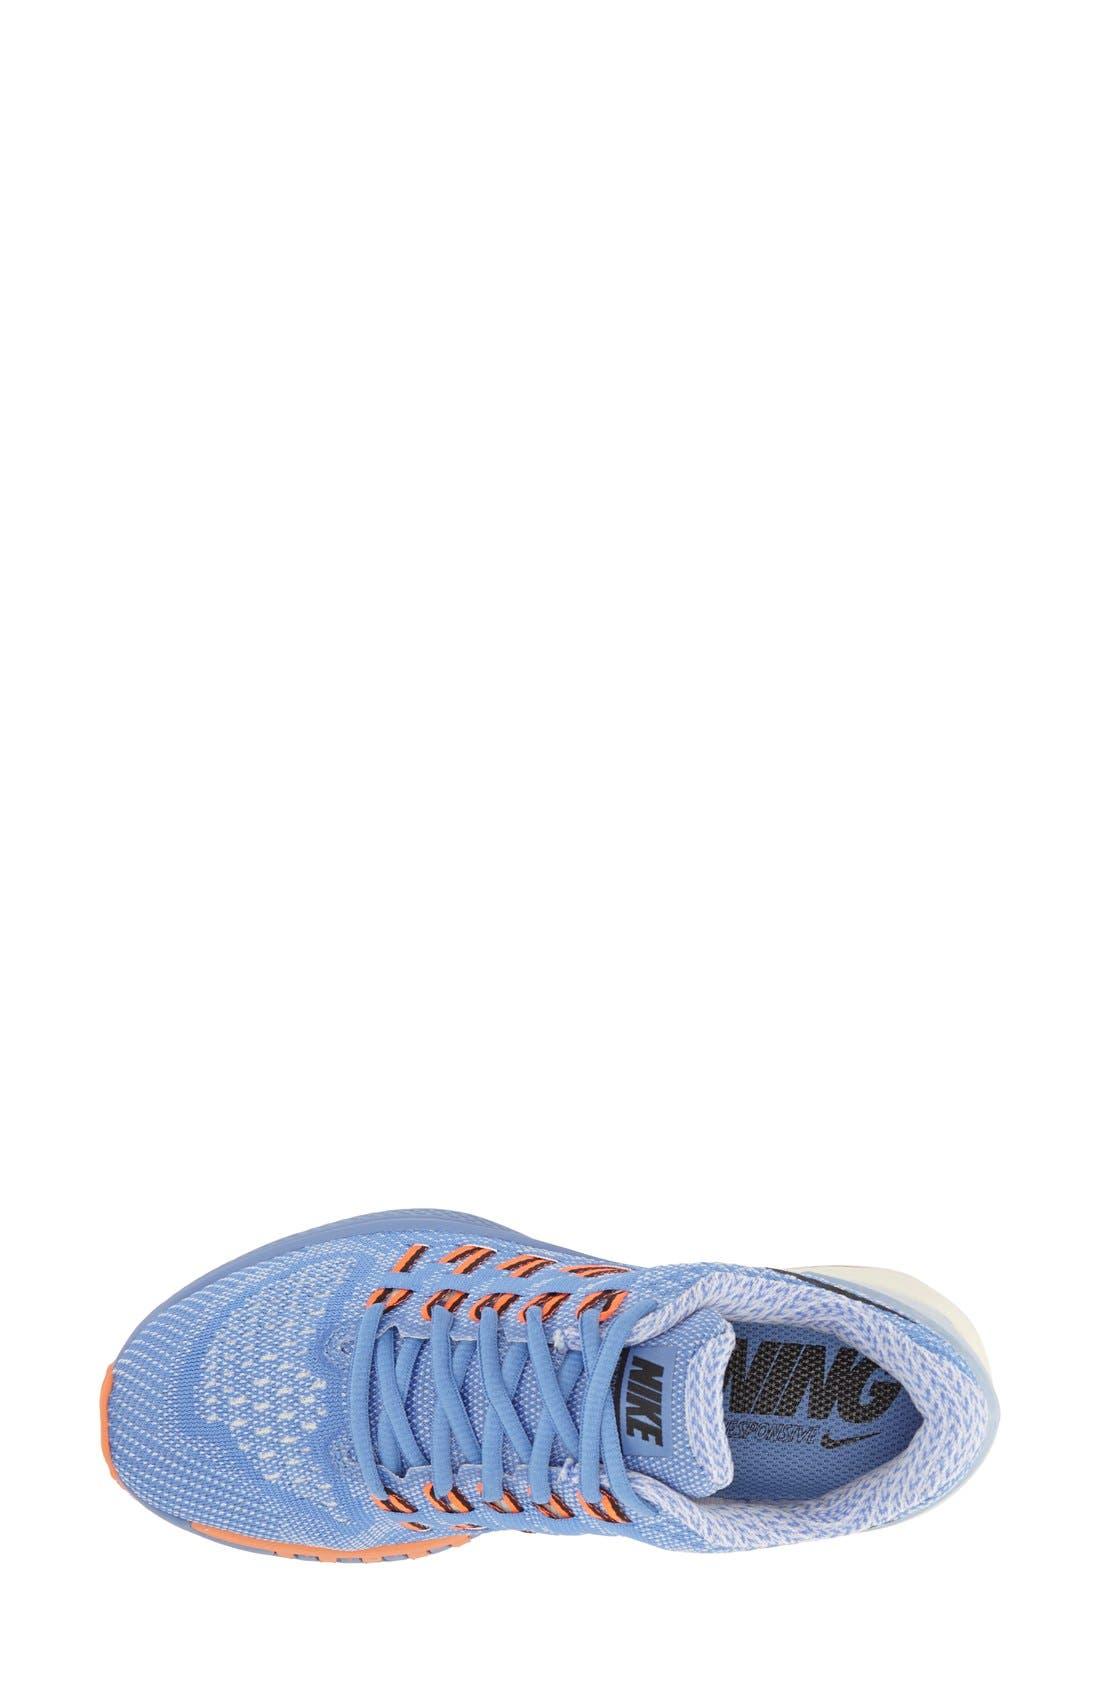 Alternate Image 3  - Nike 'Air Zoom Odyssey' Running Shoe (Women)